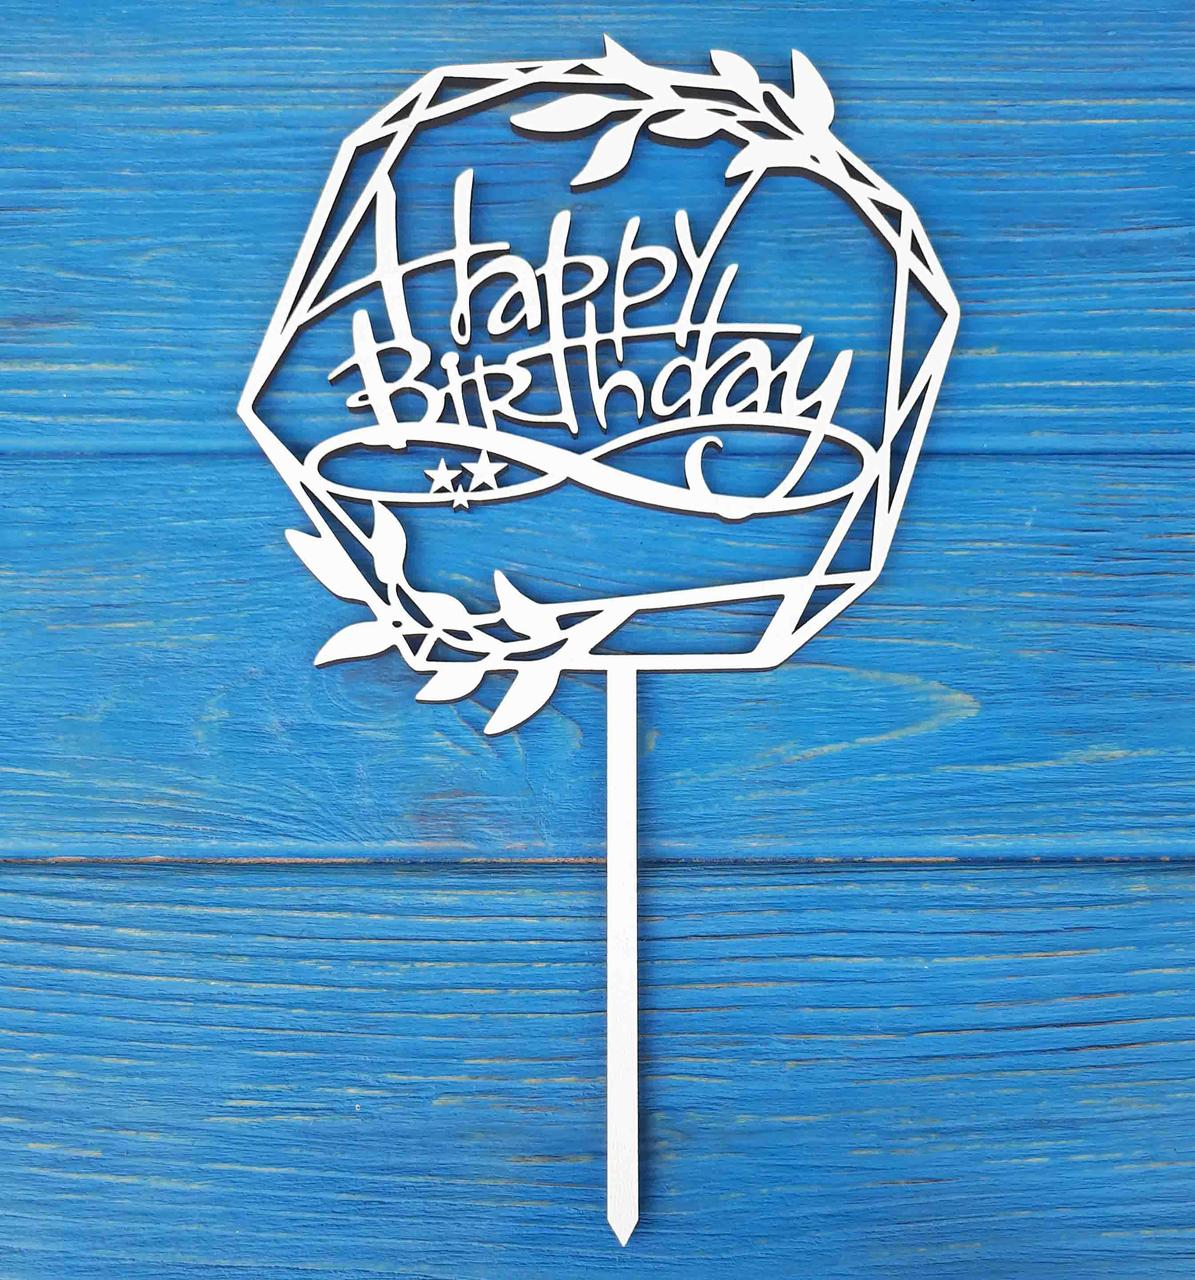 Топпер на торт на цельной ножке белый. Happy Birthday